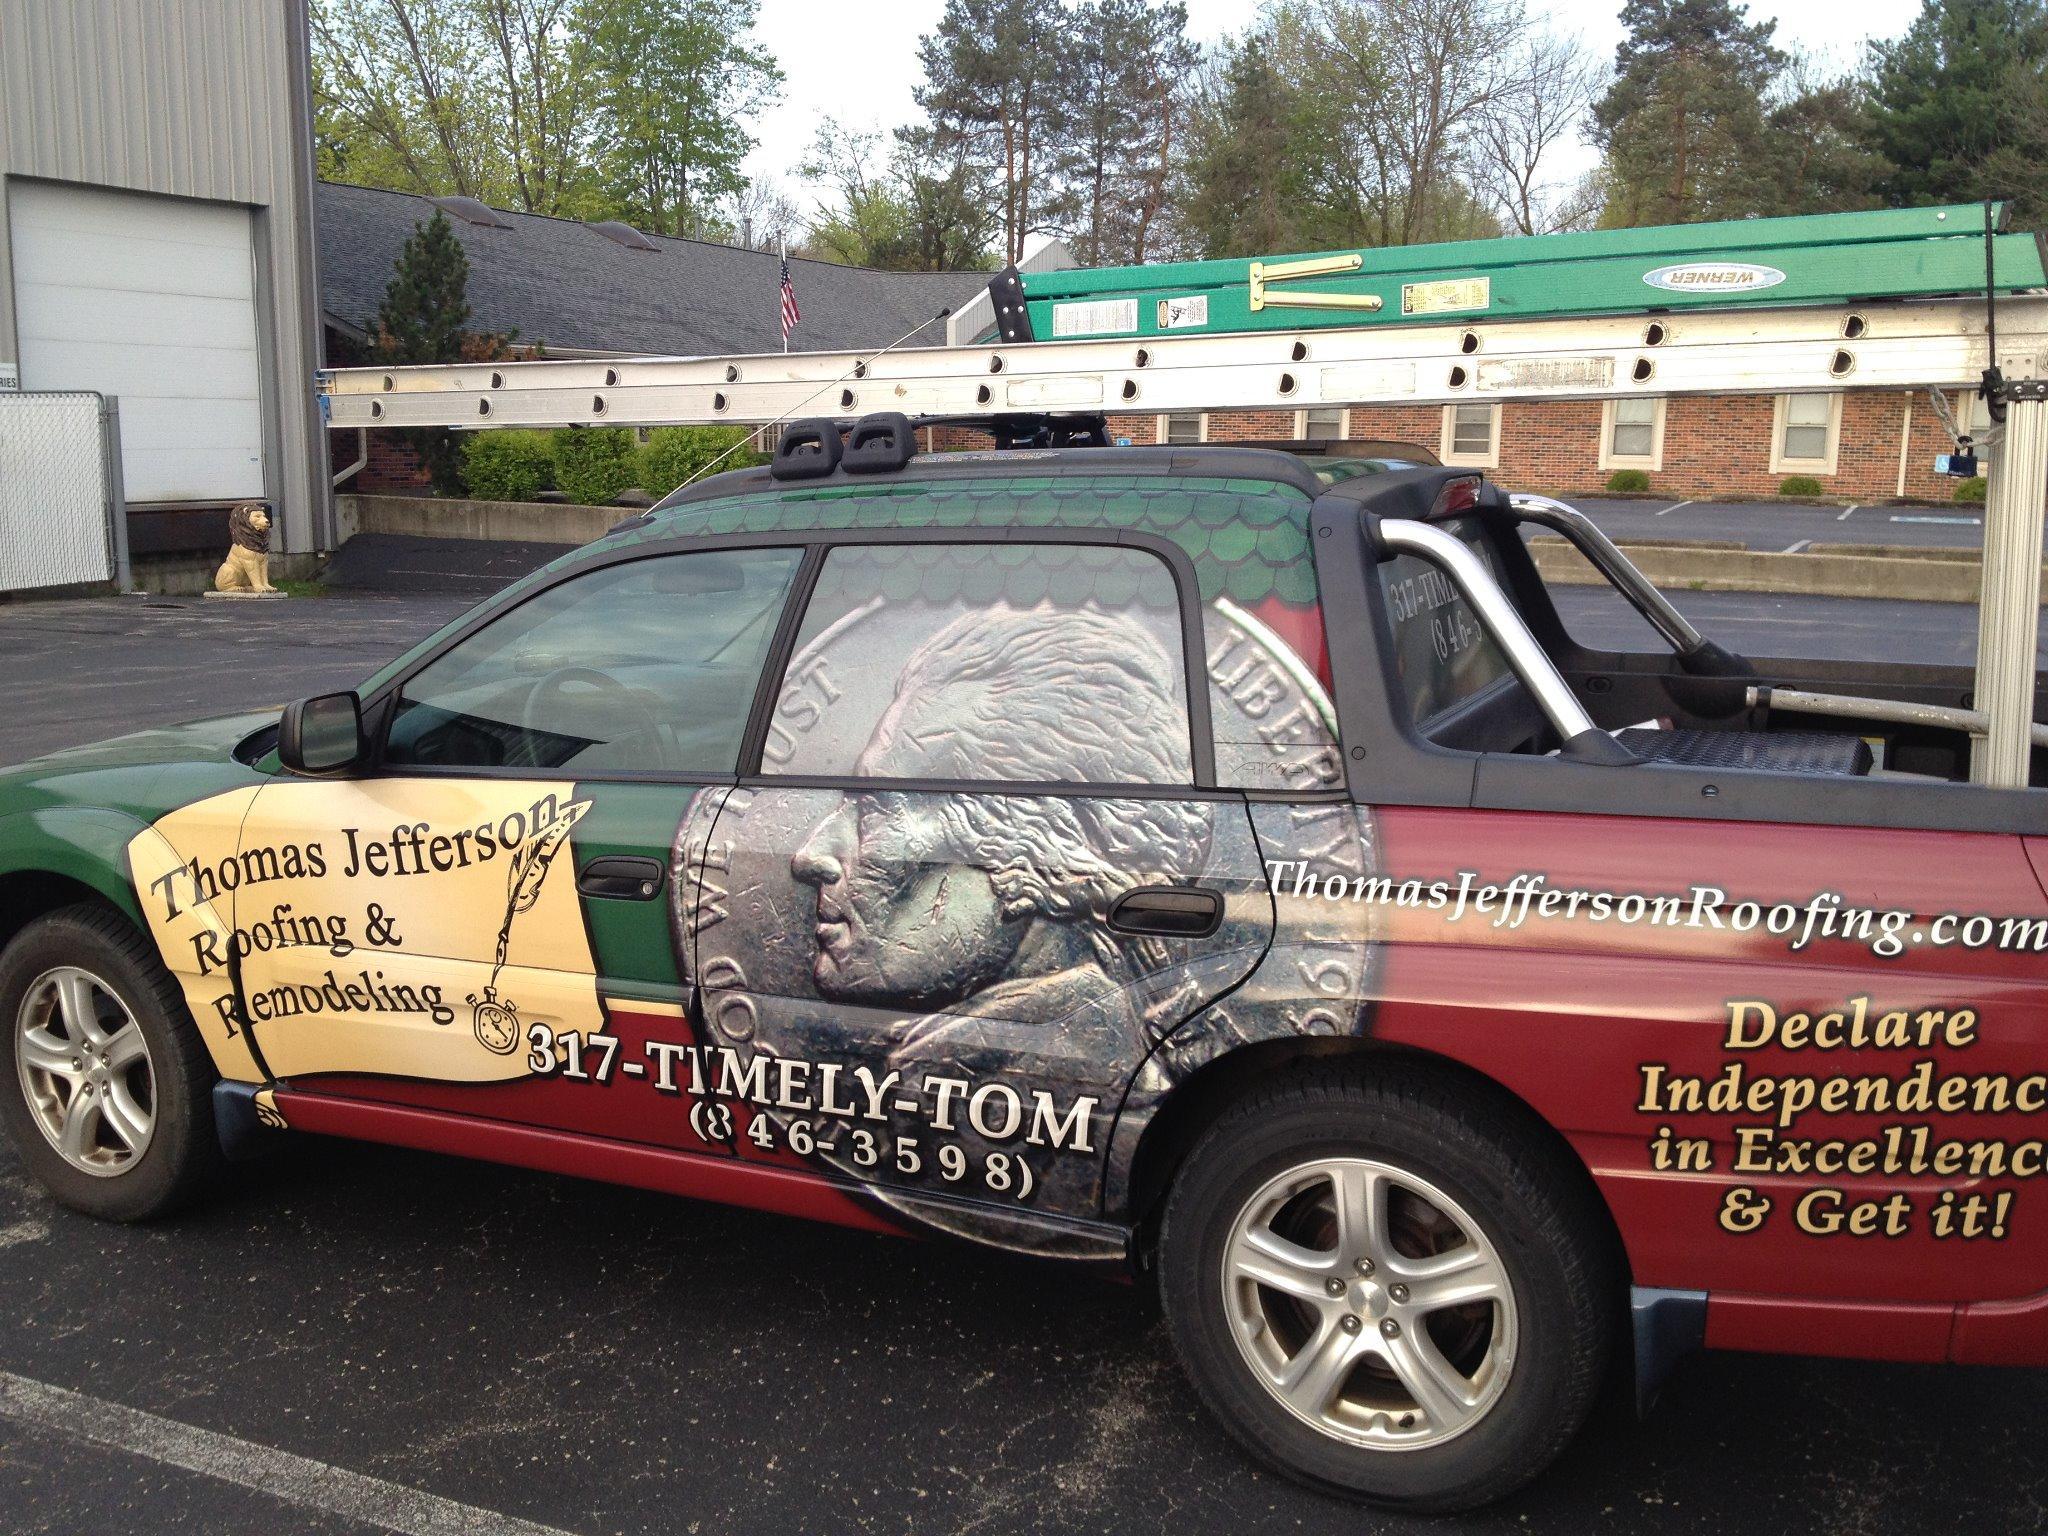 Thomas Jefferson Roofing & Remodeling LLC image 0